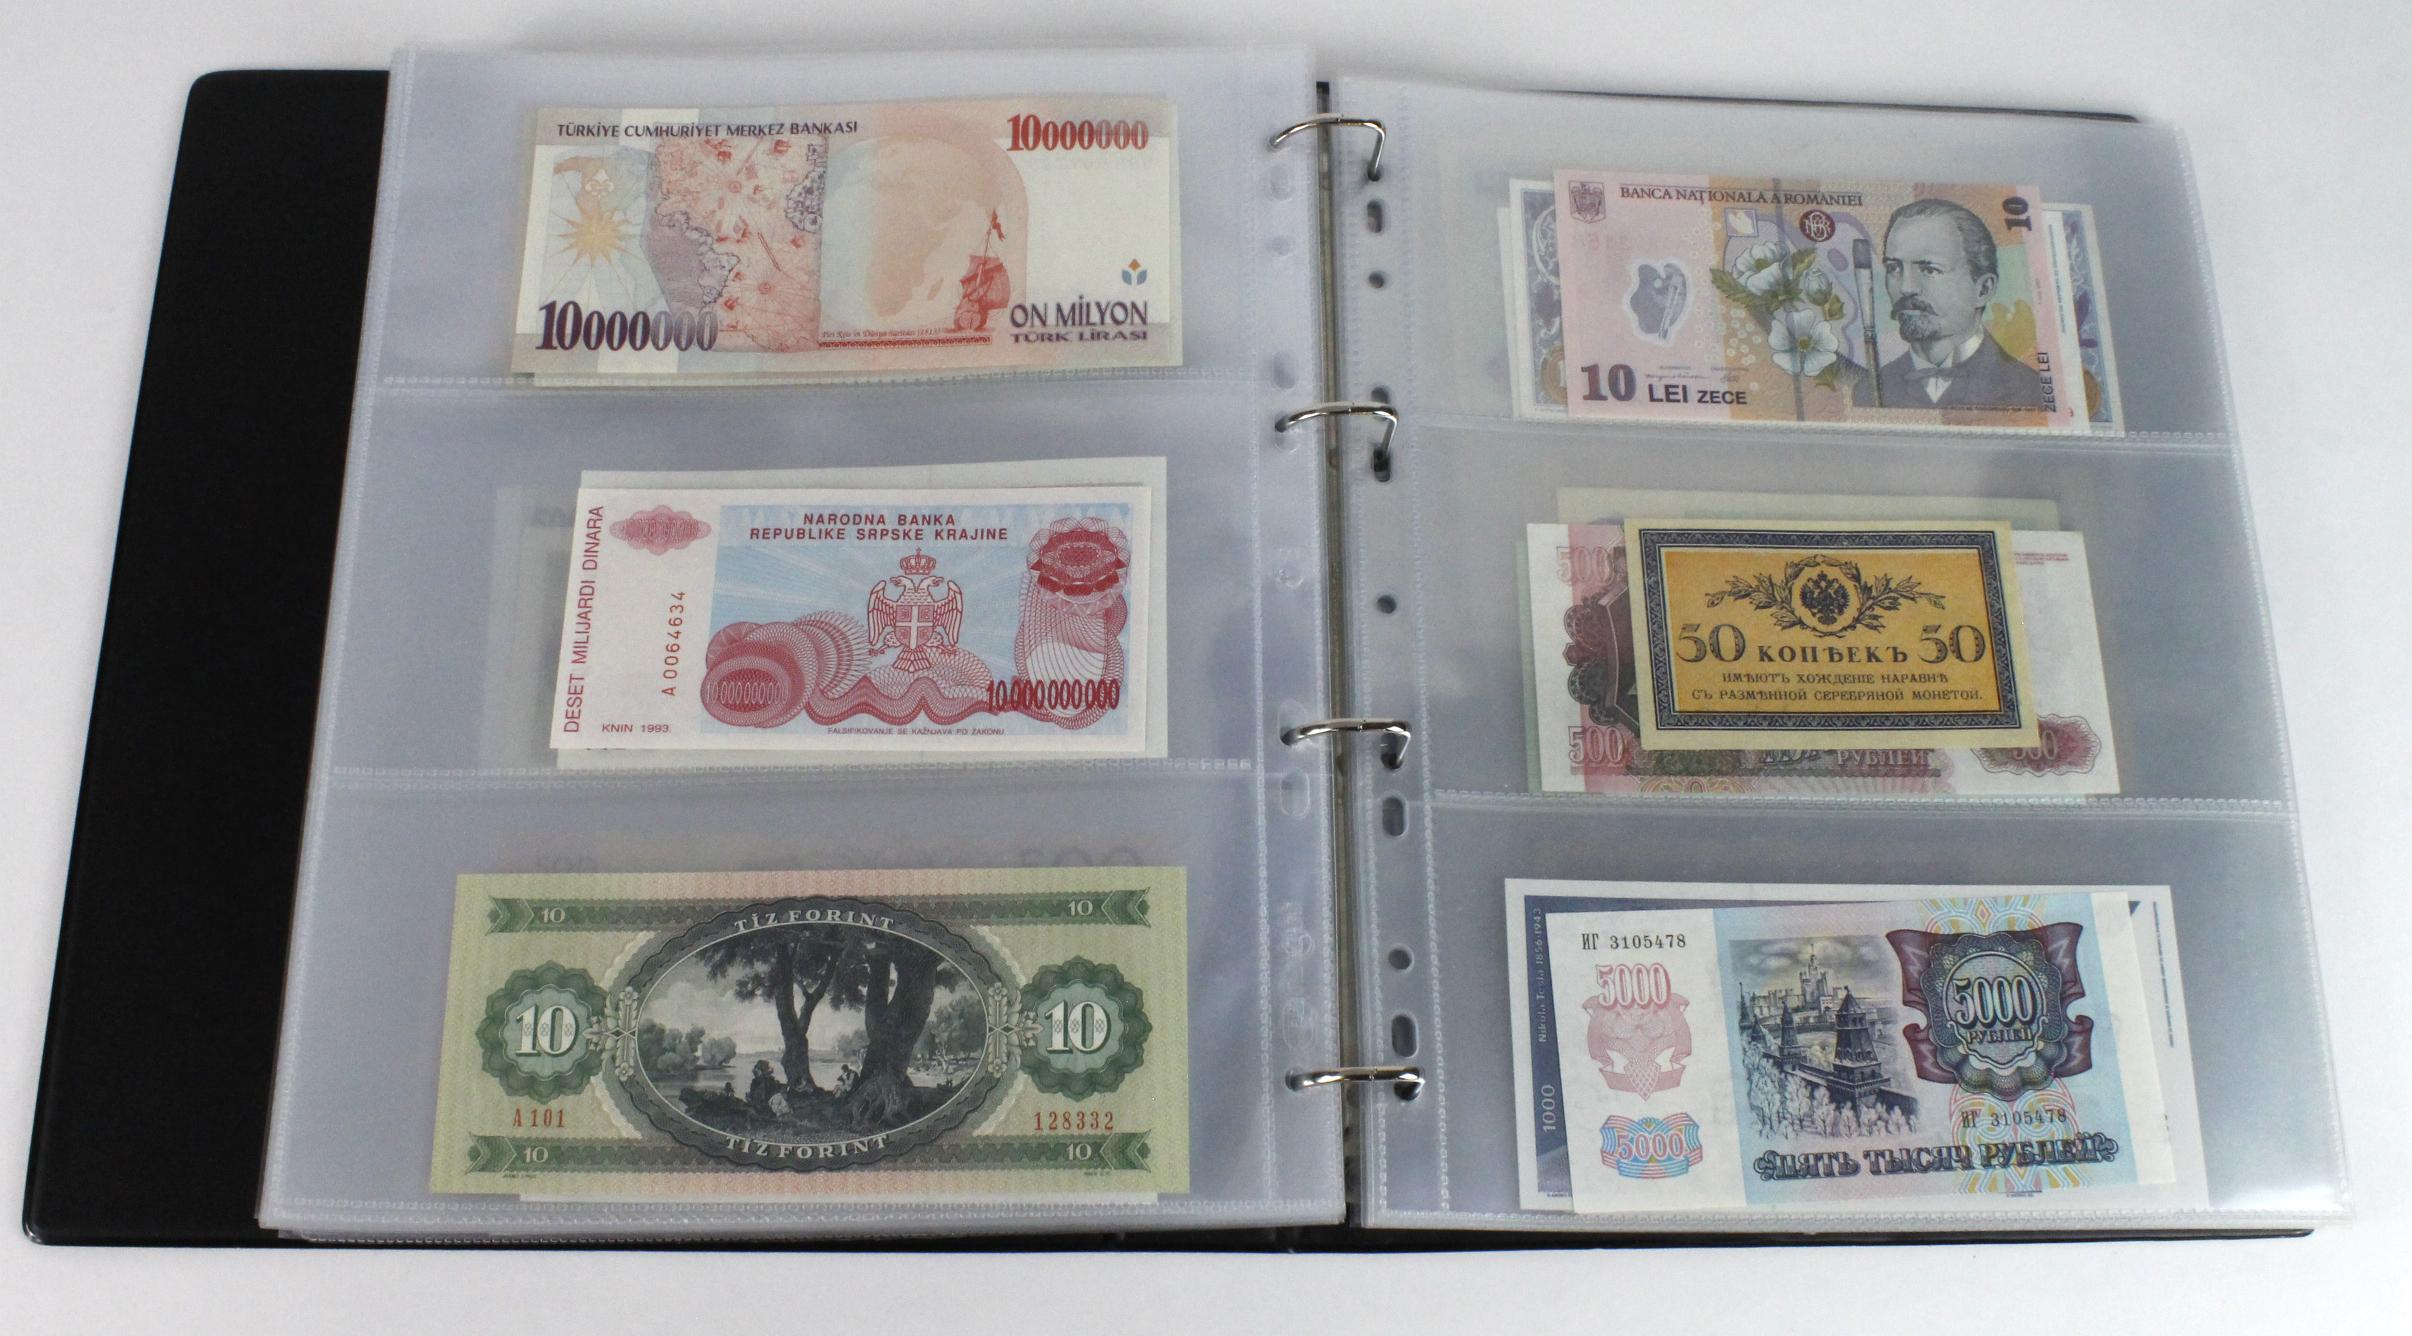 World (163), in banknote album including Bahamas, Spain, Sweden, Netherlands, Algeria, Macau, - Image 42 of 57